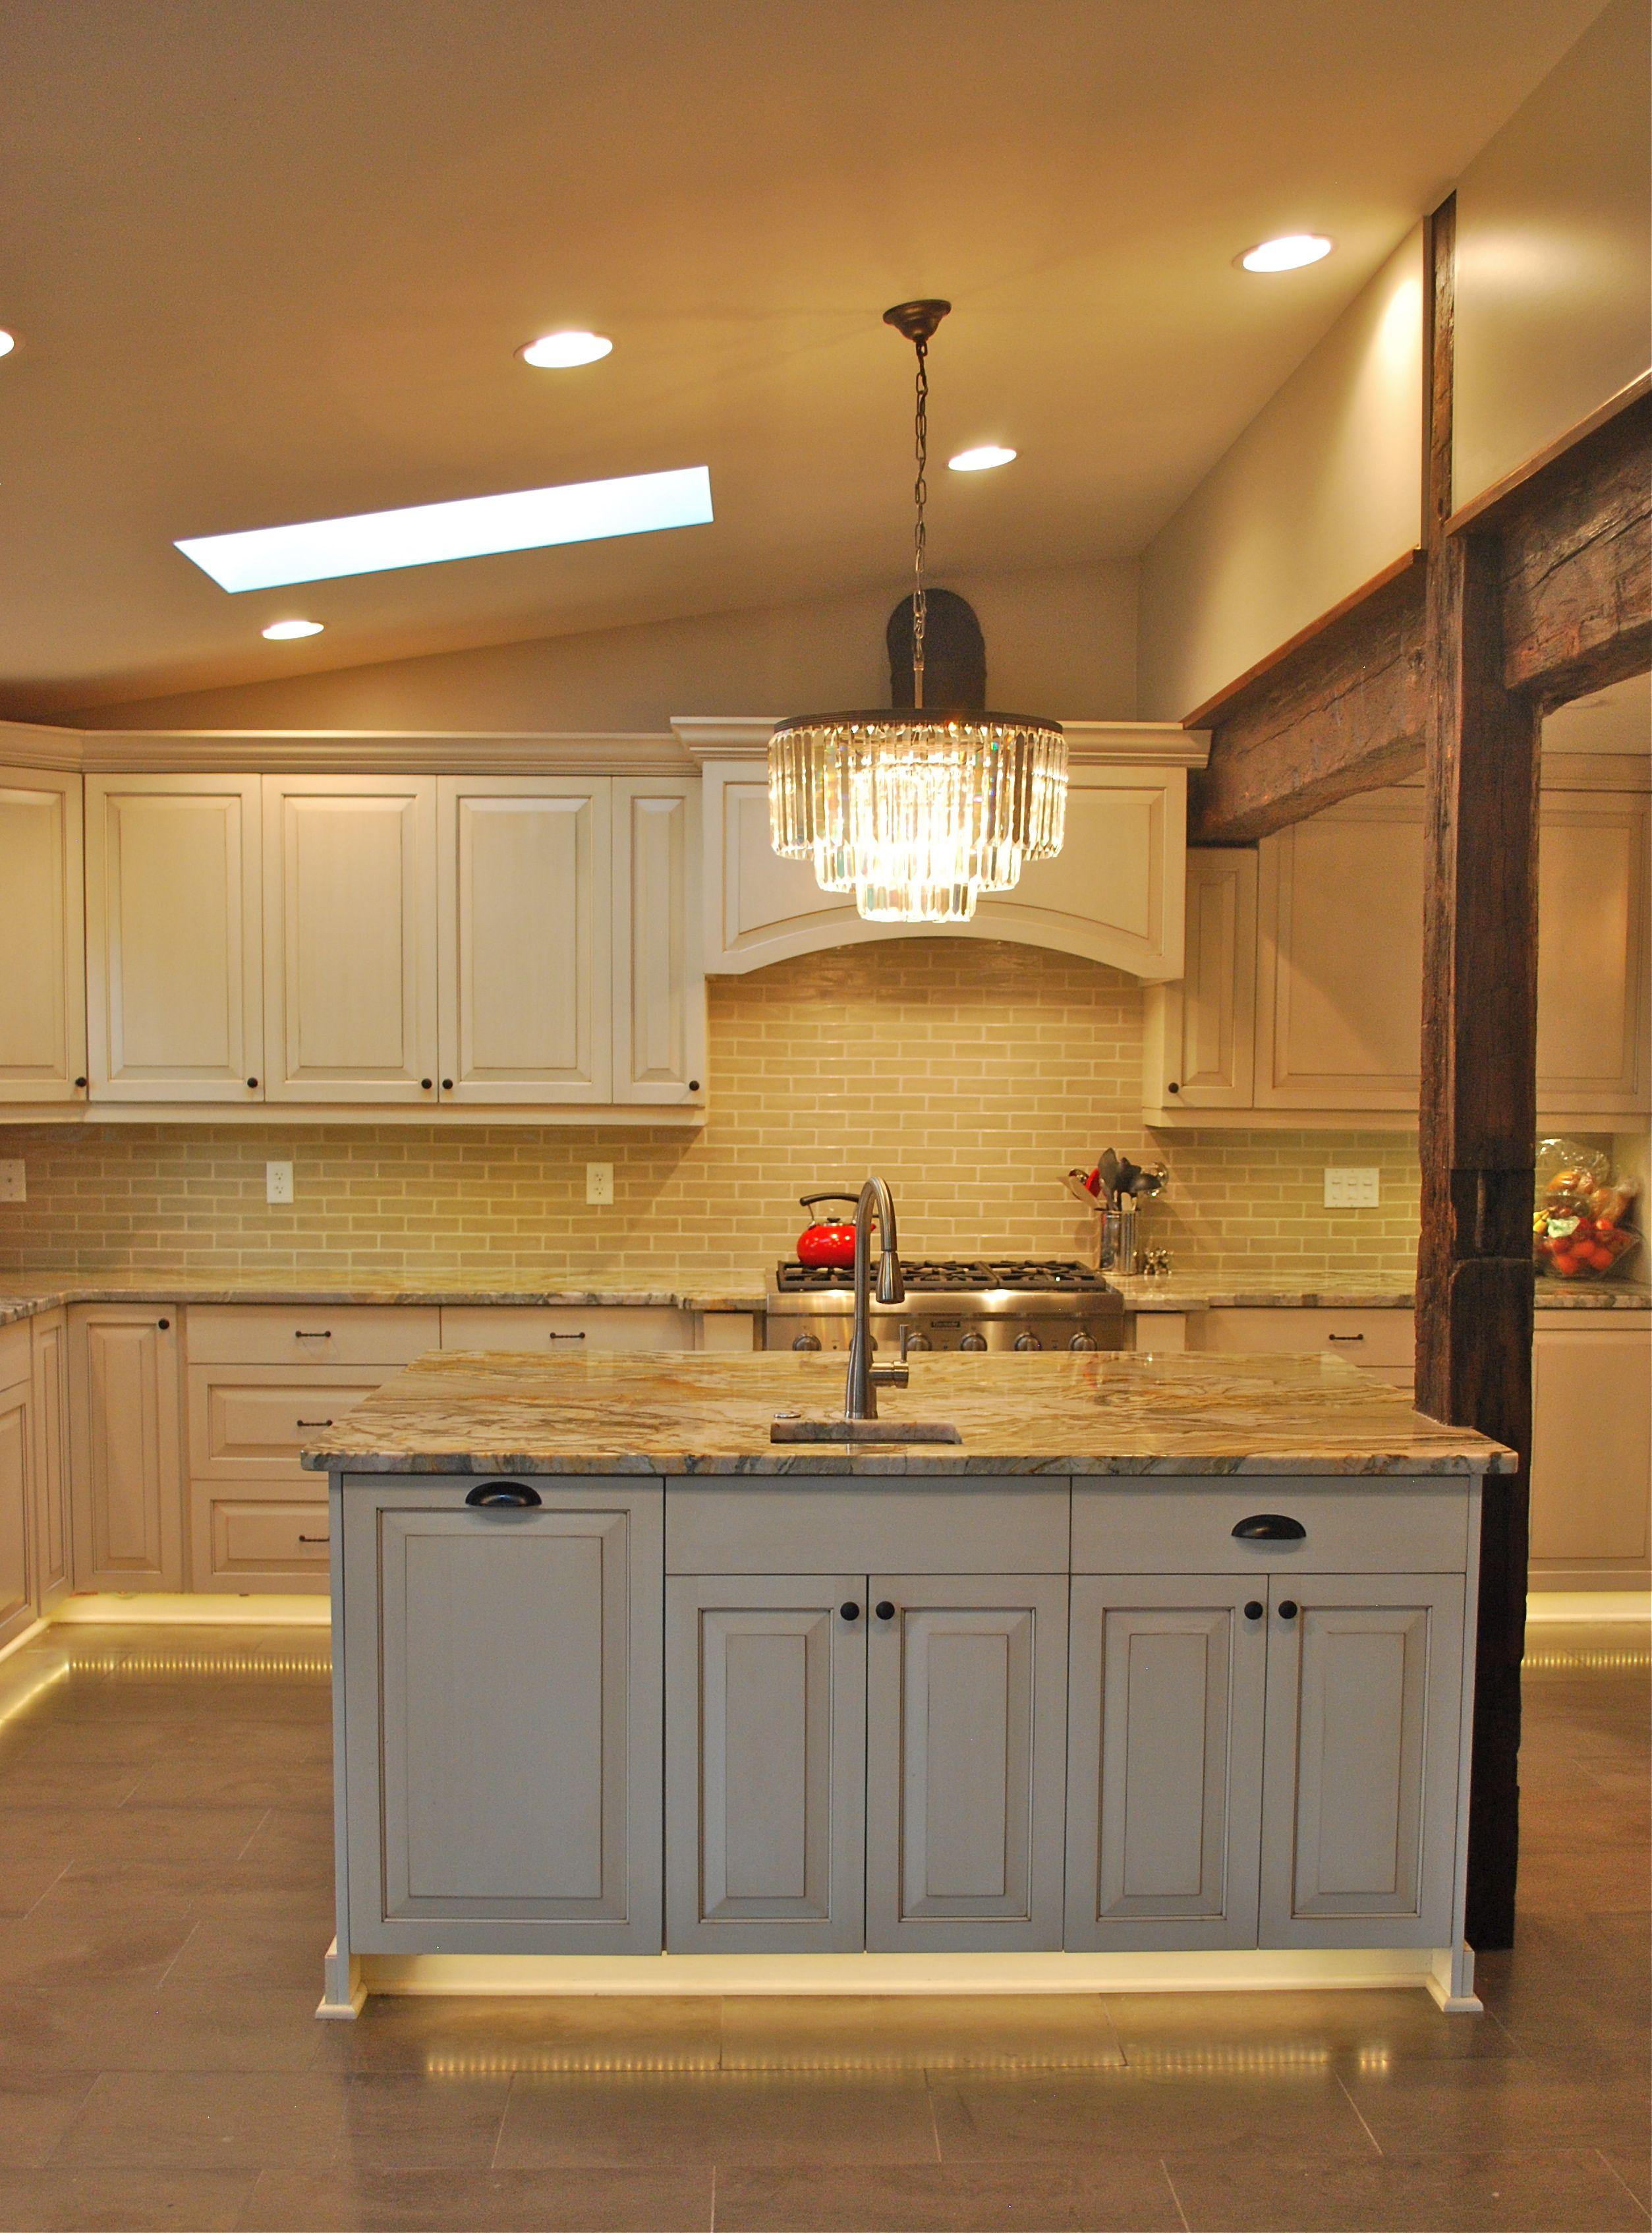 Pin By Inspired Led On Viking Kitchen Allison Park Kitchen Kitchen Renovation Home Lighting Kitchen